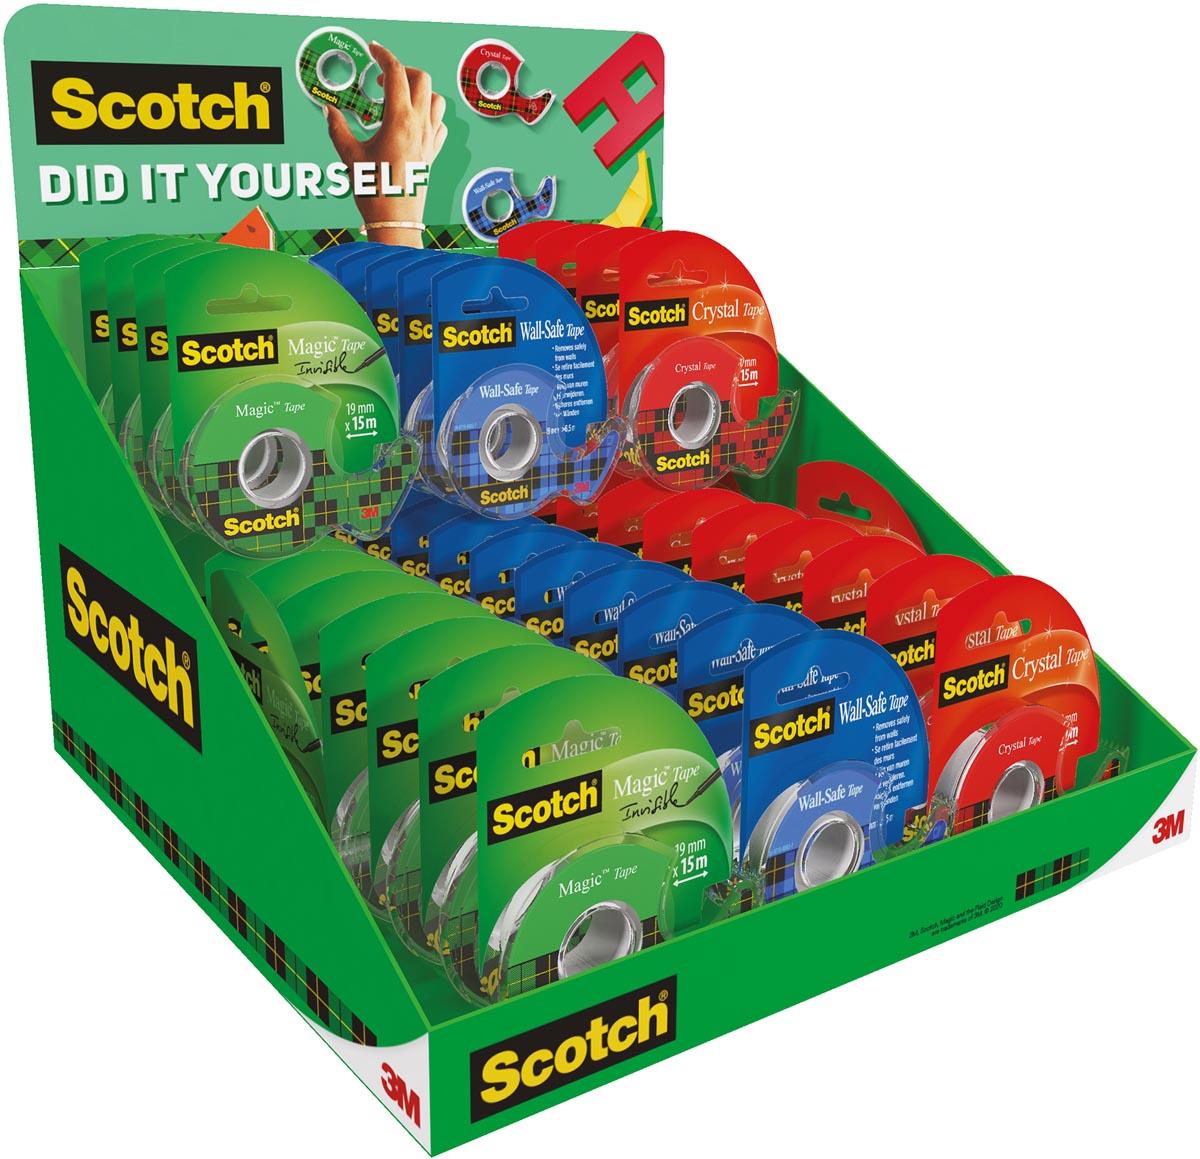 Scotch plakband toonbank display mix met 48 stuks